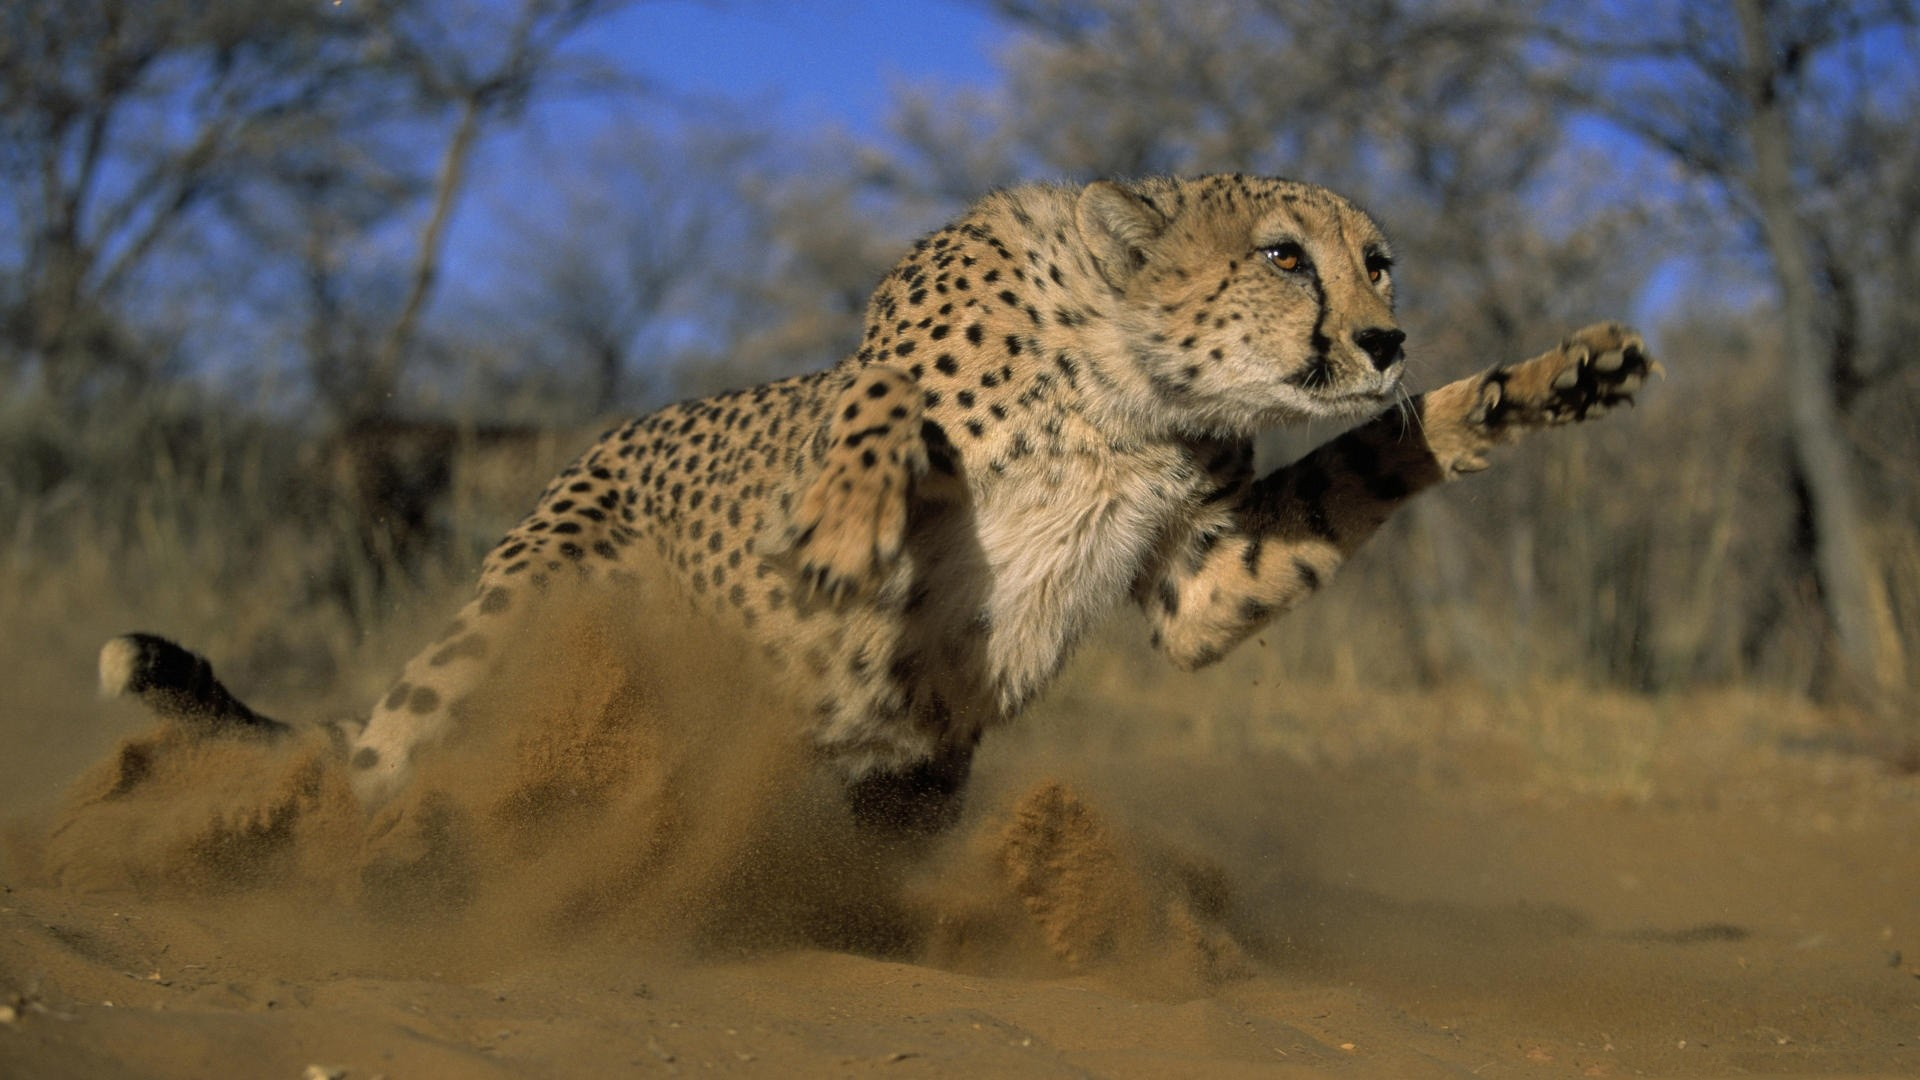 Res: 1920x1080, Wallpaper Cheetah, Jump, Run, Field, Grass, Dust HD, Picture, Image